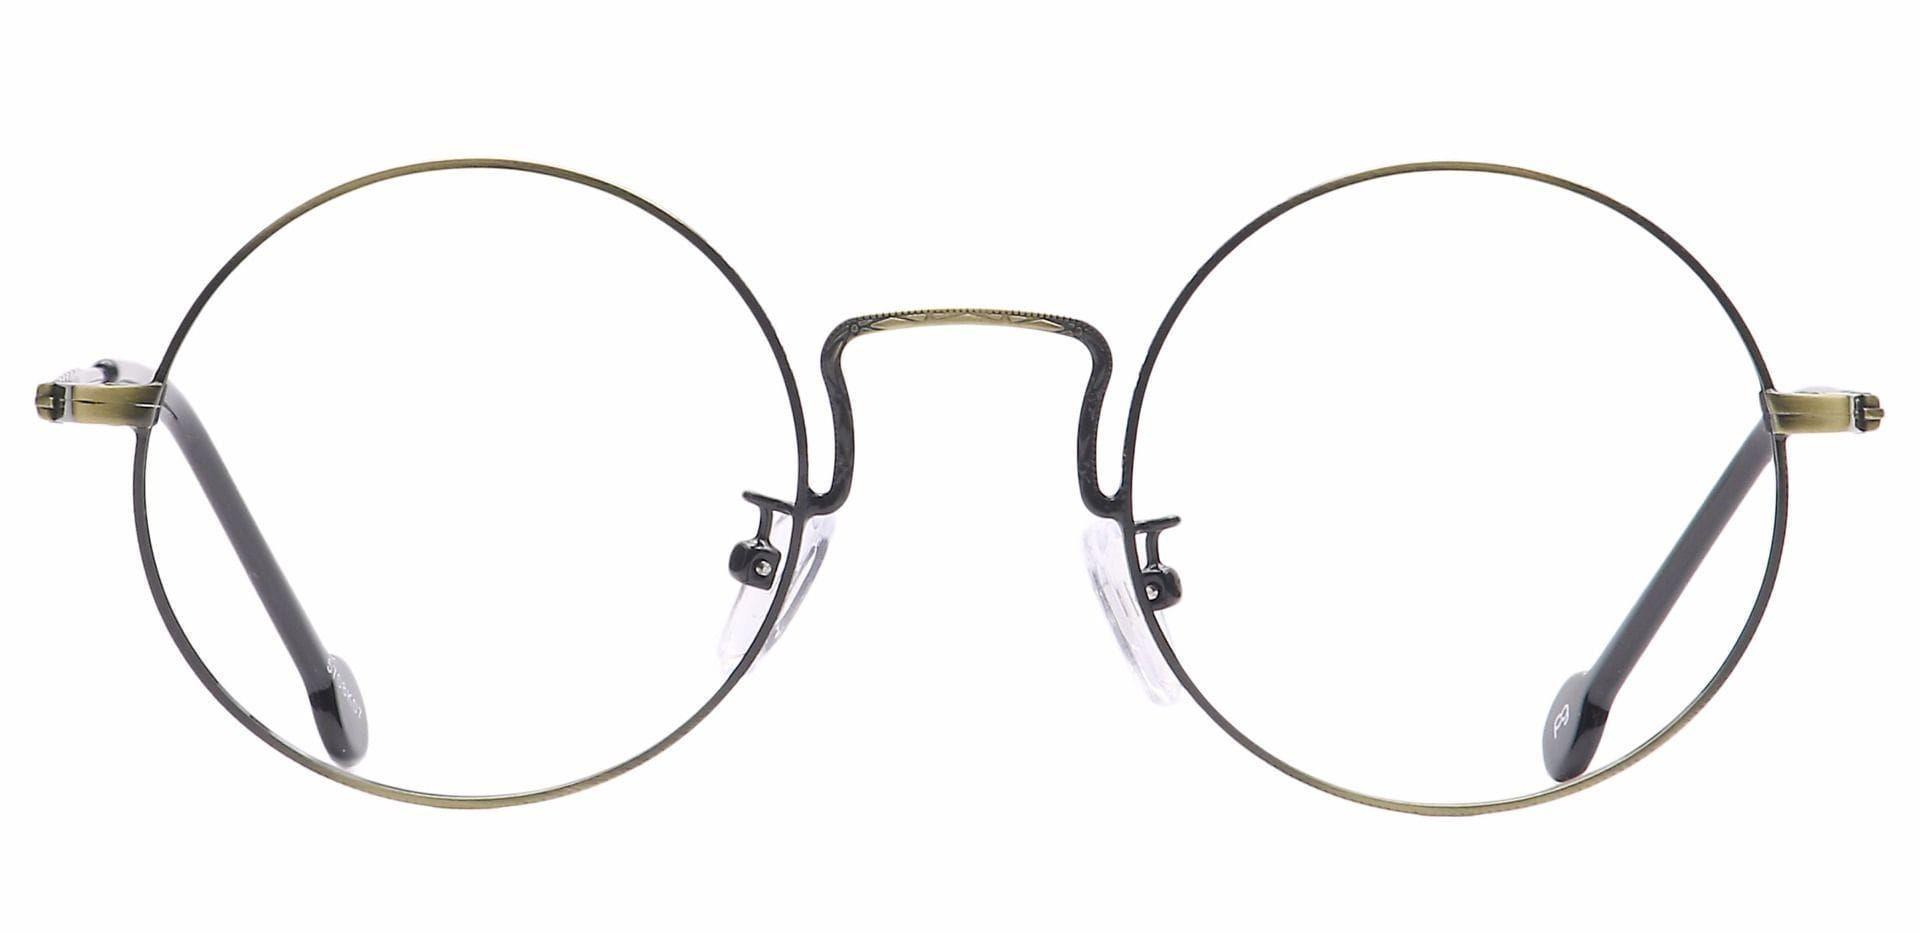 Nonpareil Circular Blue Light Blocking Glasses - Black